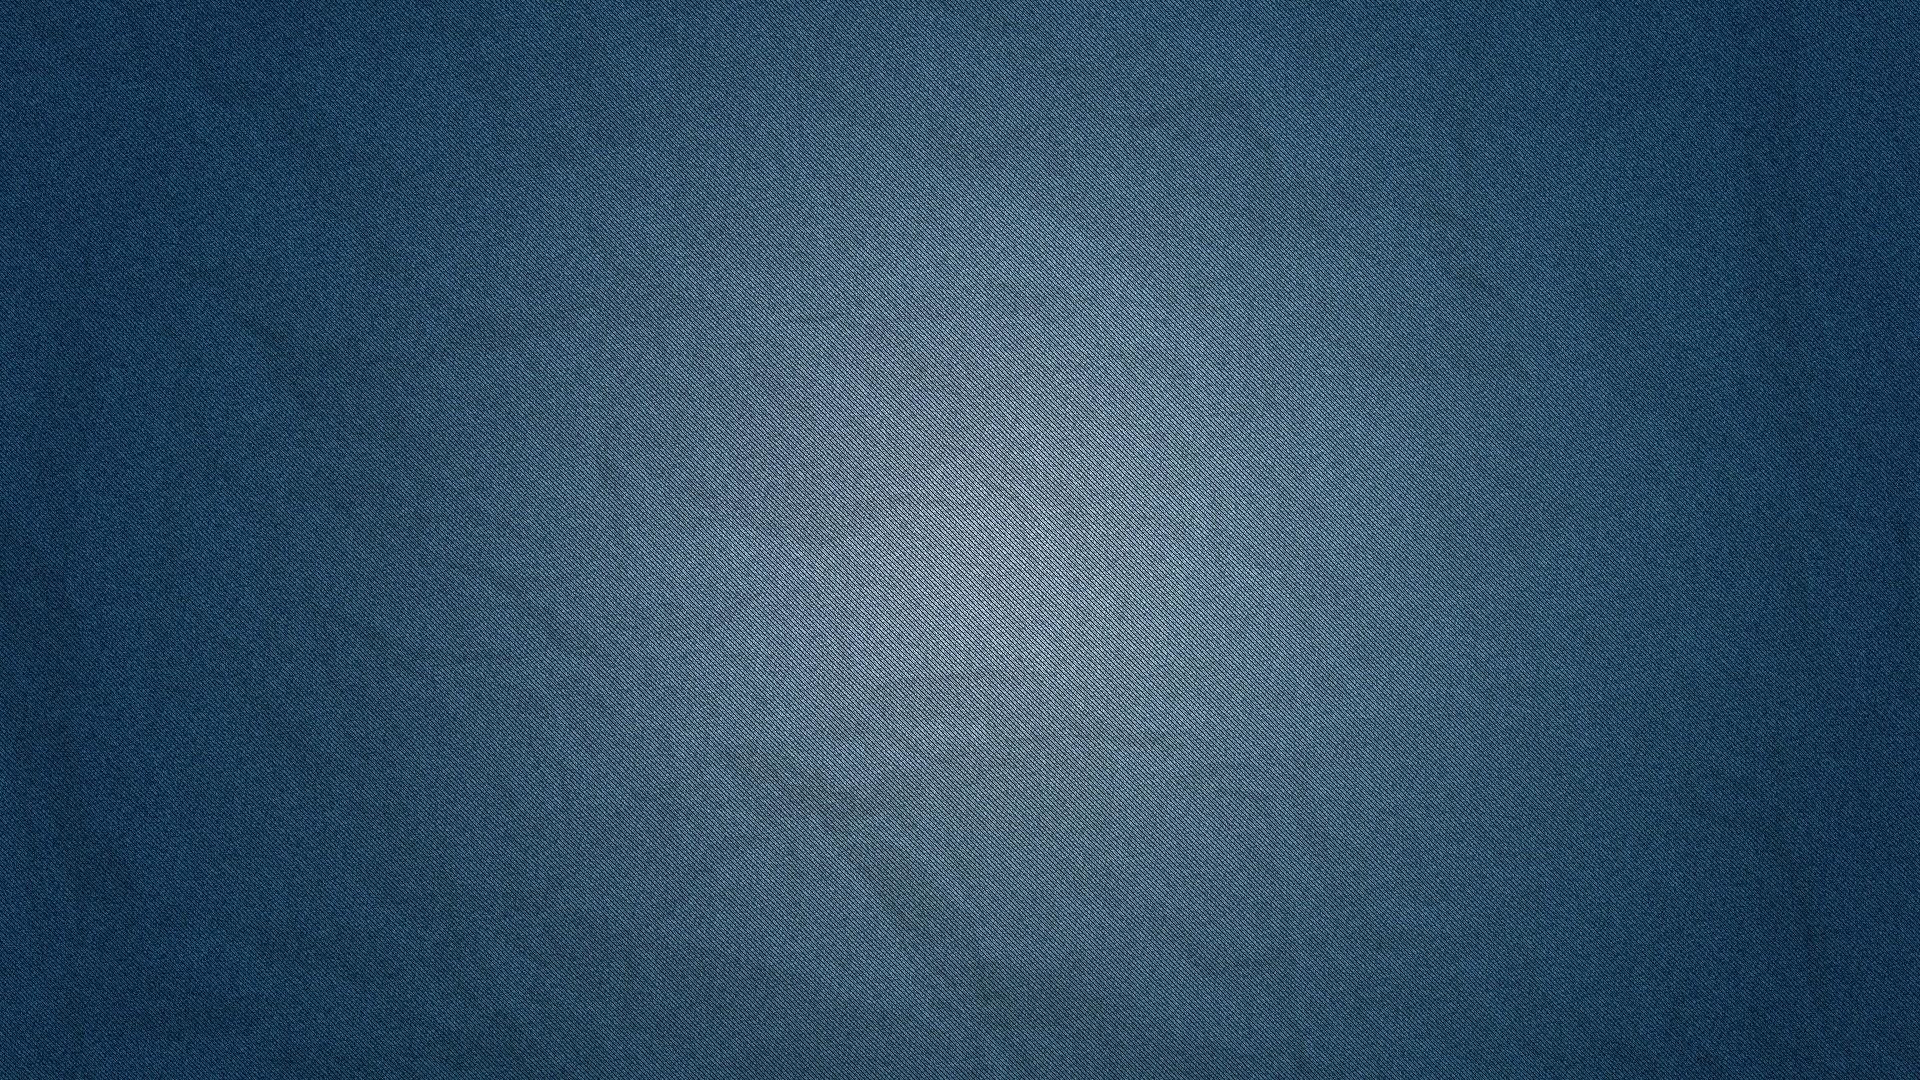 Solid Color hd wallpaper download